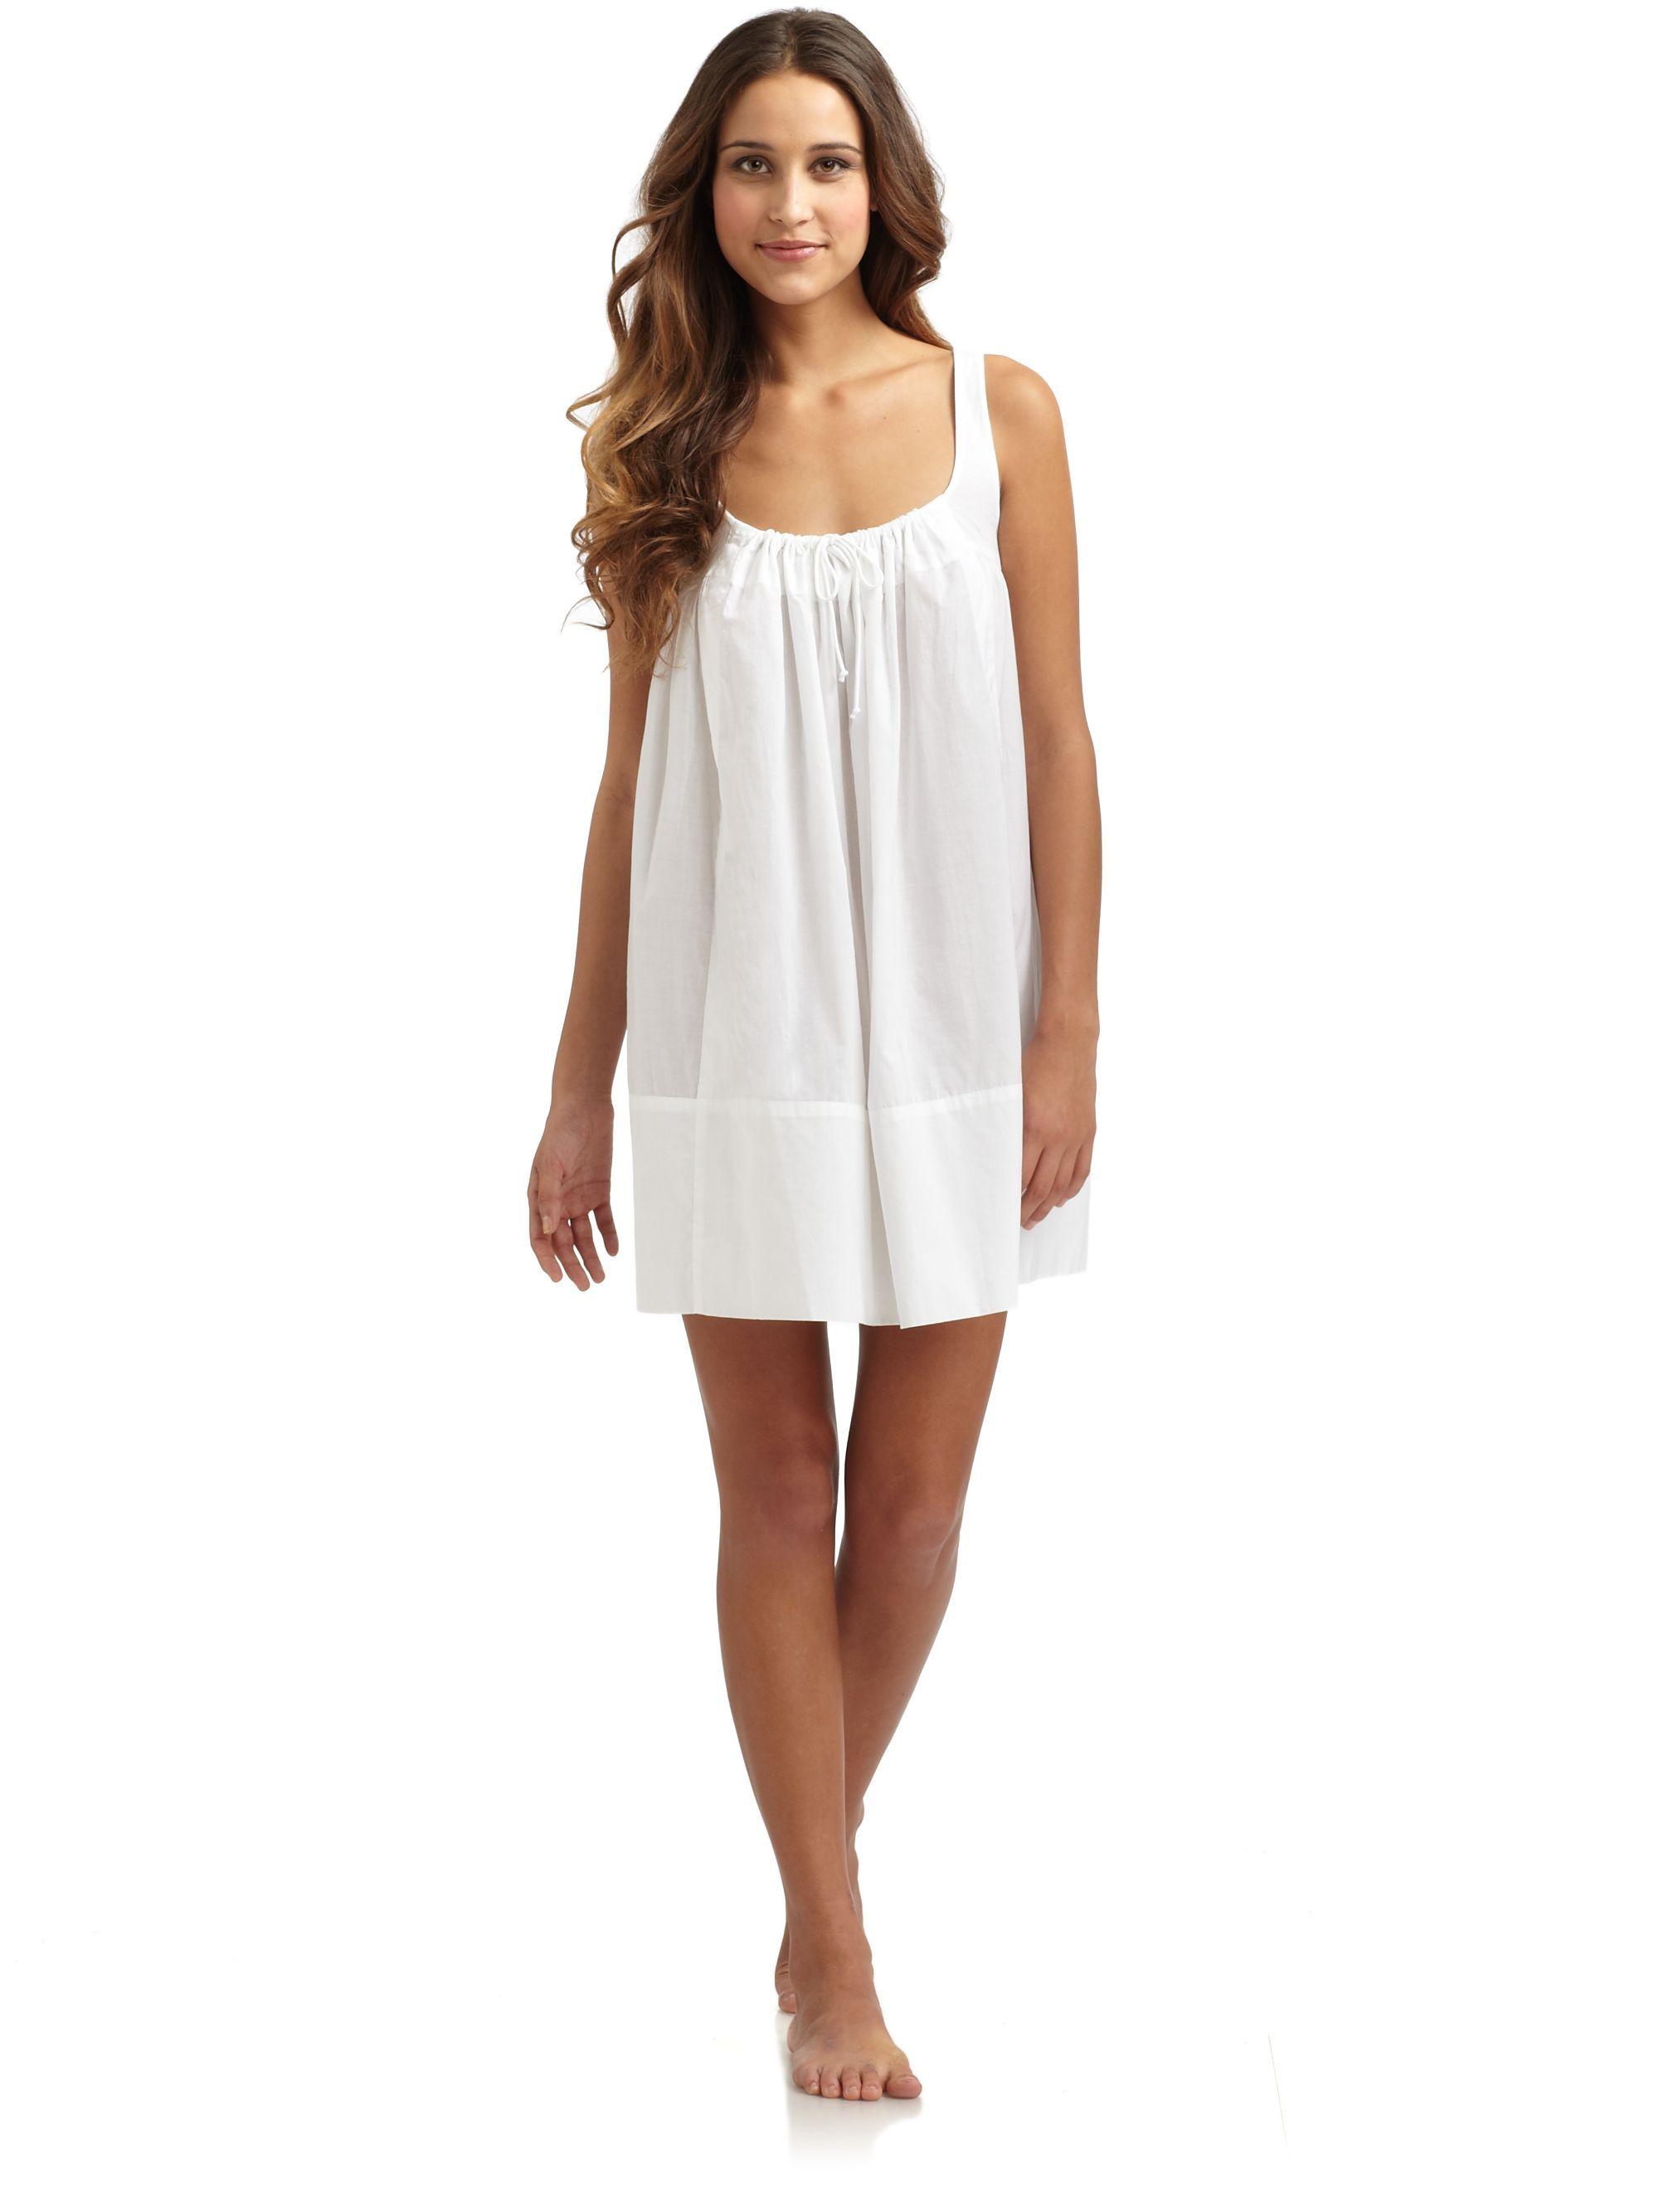 fc8013204267 Donna karan new york Cotton Batiste Short Sleeveless Nightgown in White |  Lyst